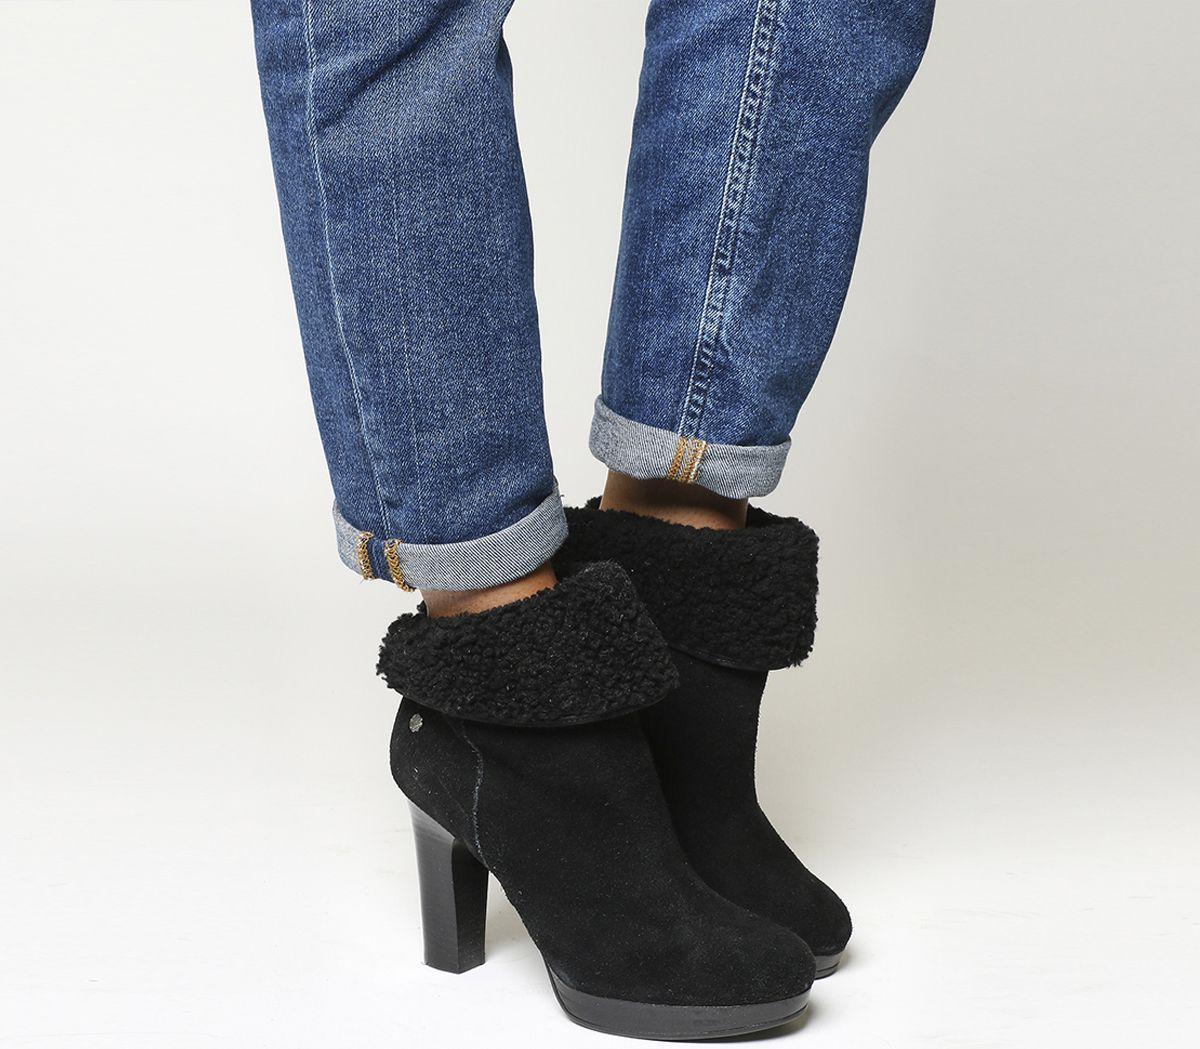 bbb2295bd3f Dandylion 11 Heels